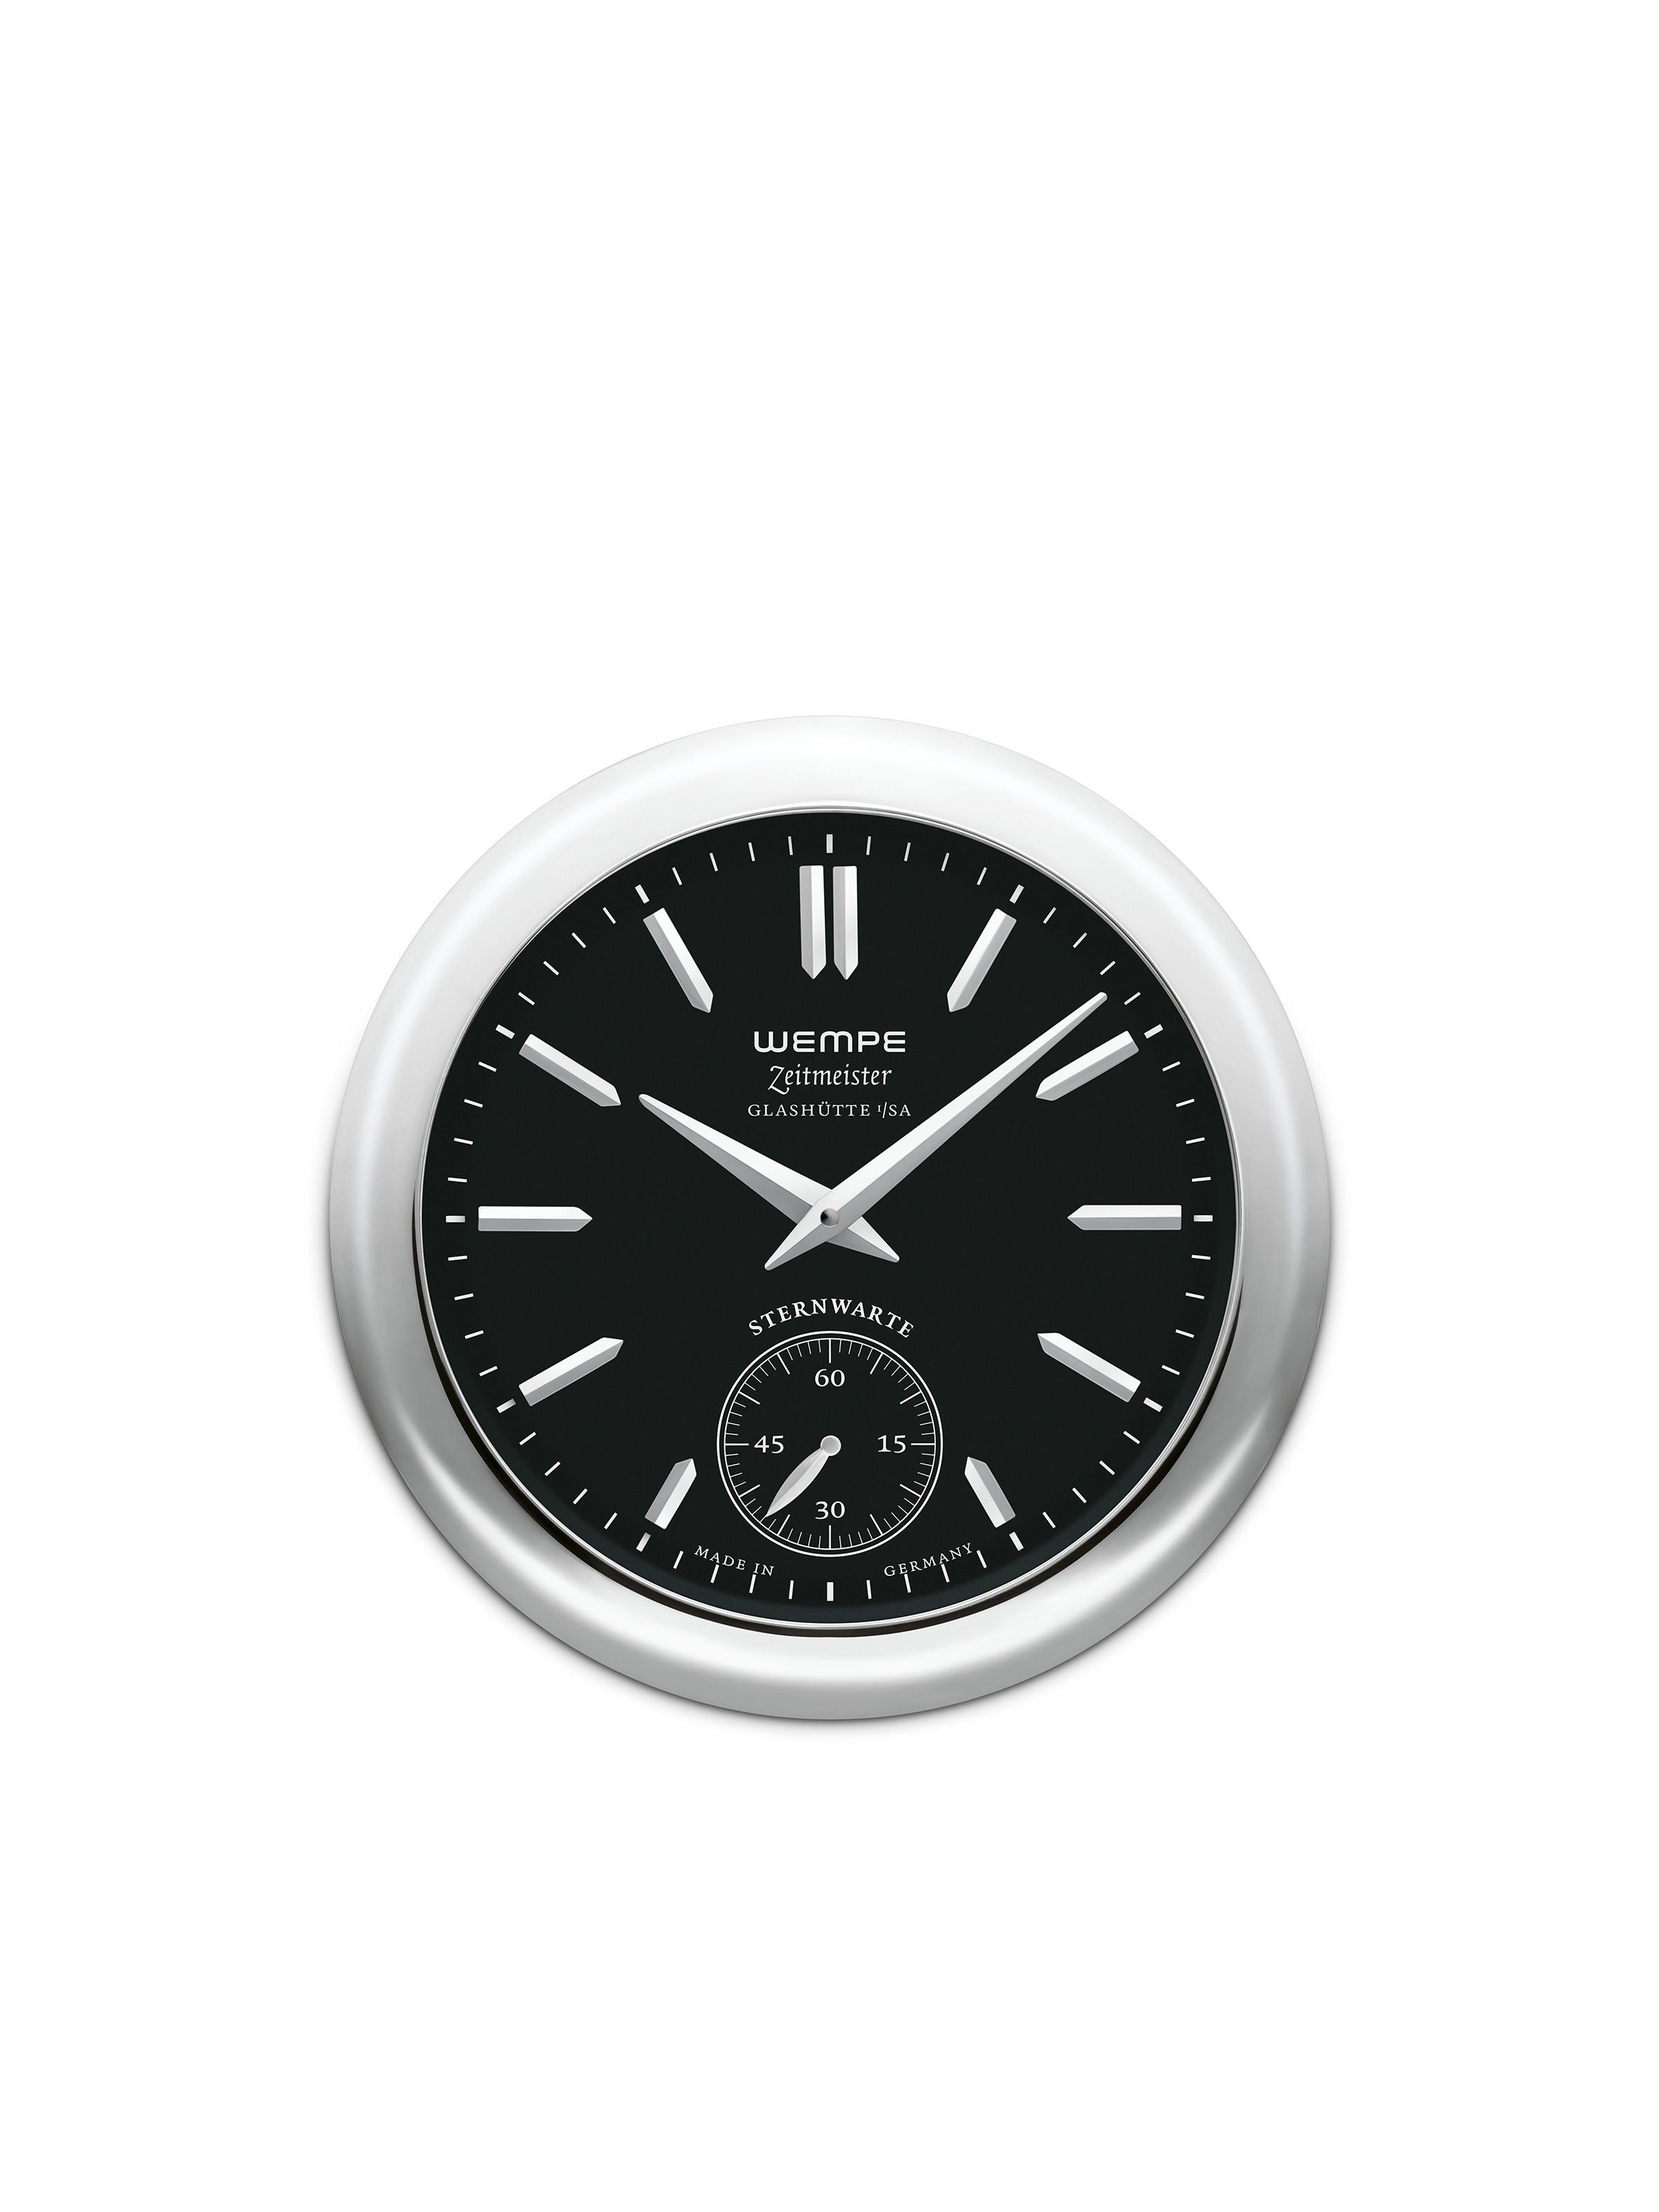 Zeitmeister Wall Clock